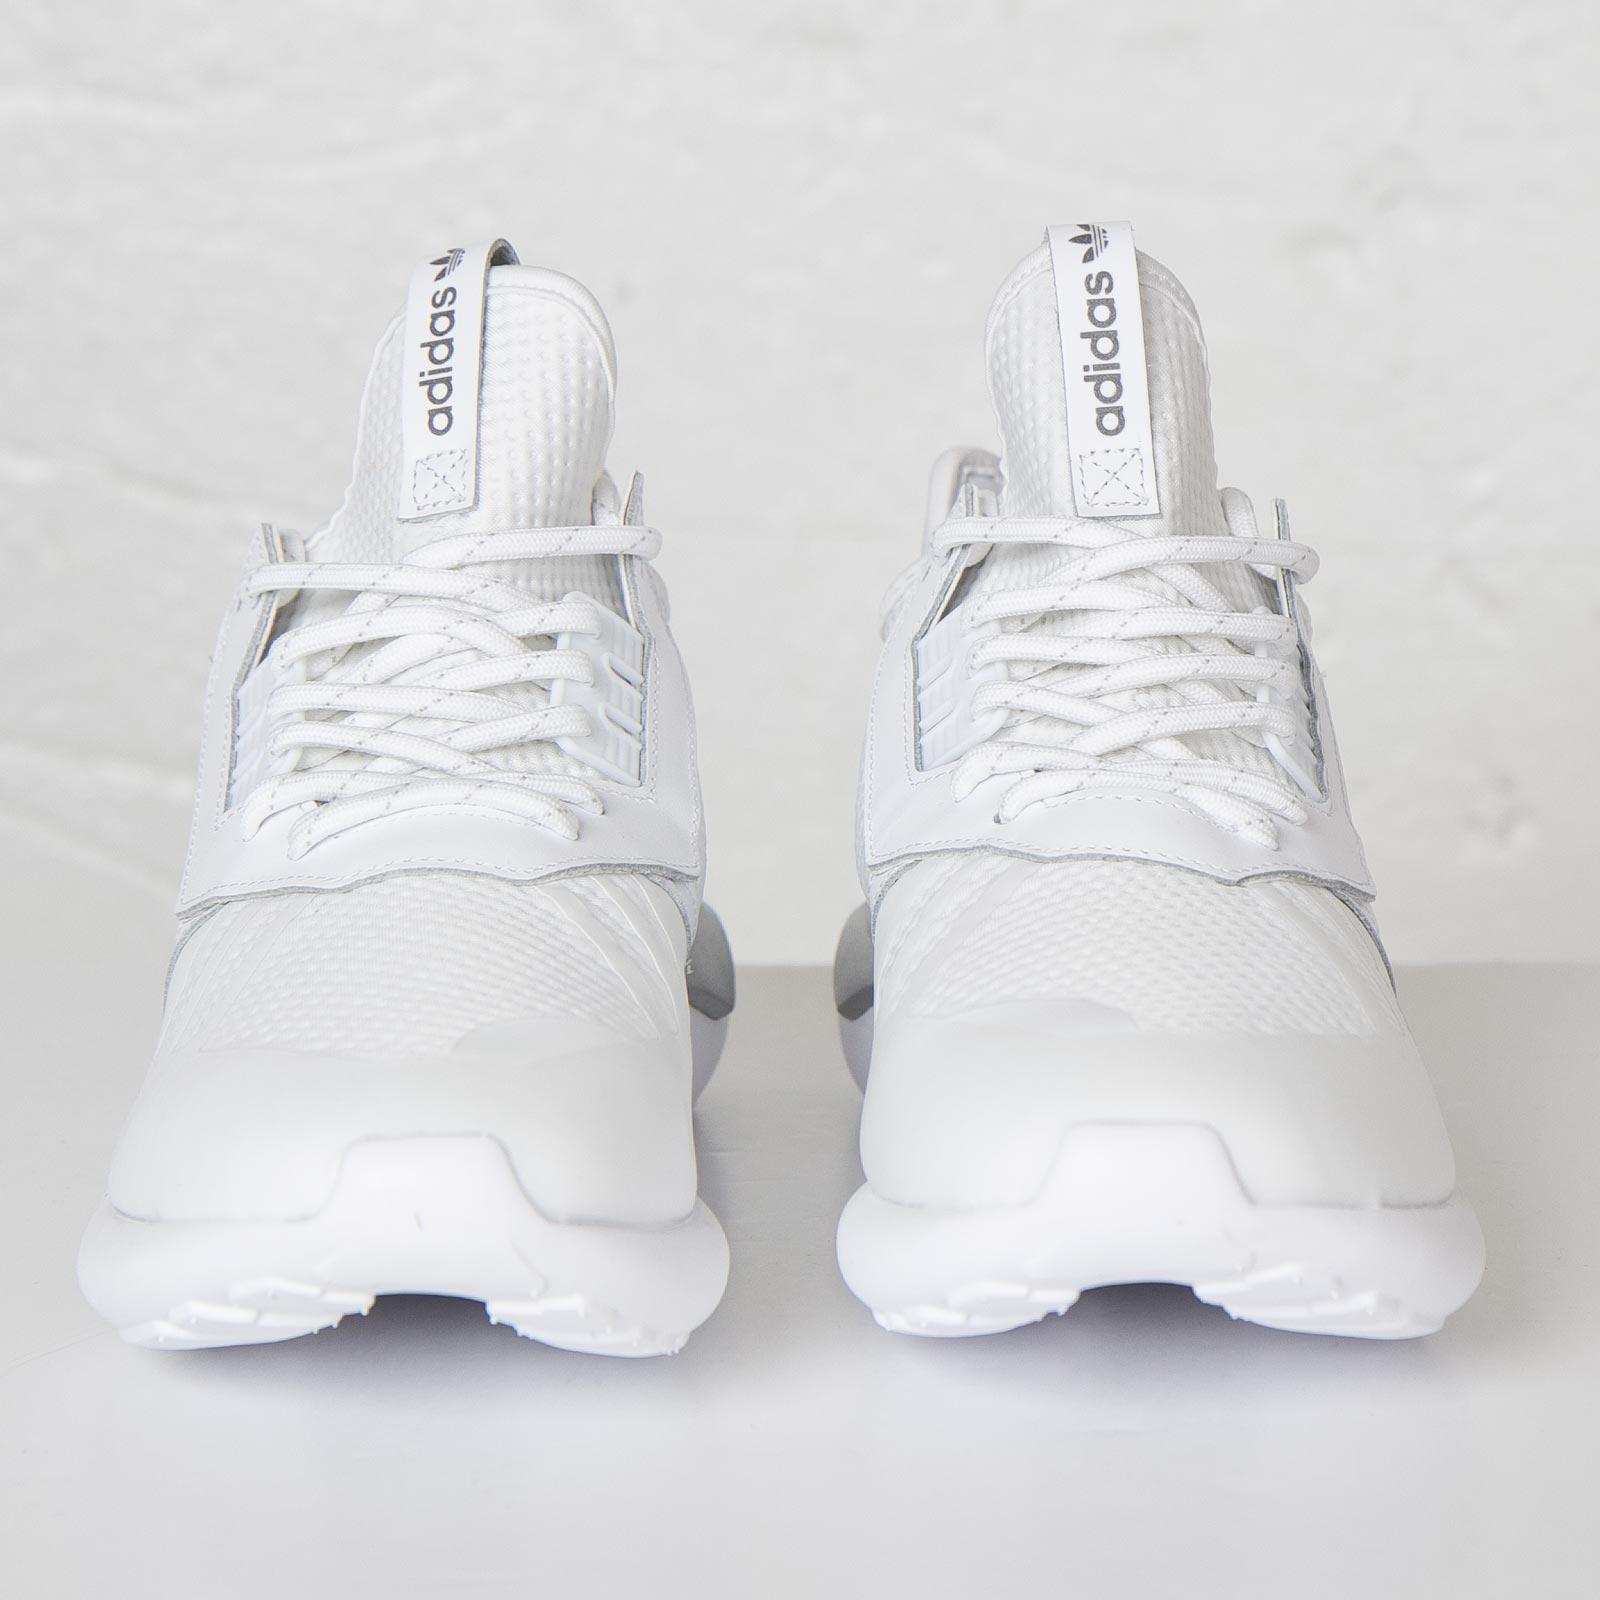 sale retailer 12e5a aac14 adidas Tubular Runner - B25527 - Sneakersnstuff   sneakers ...